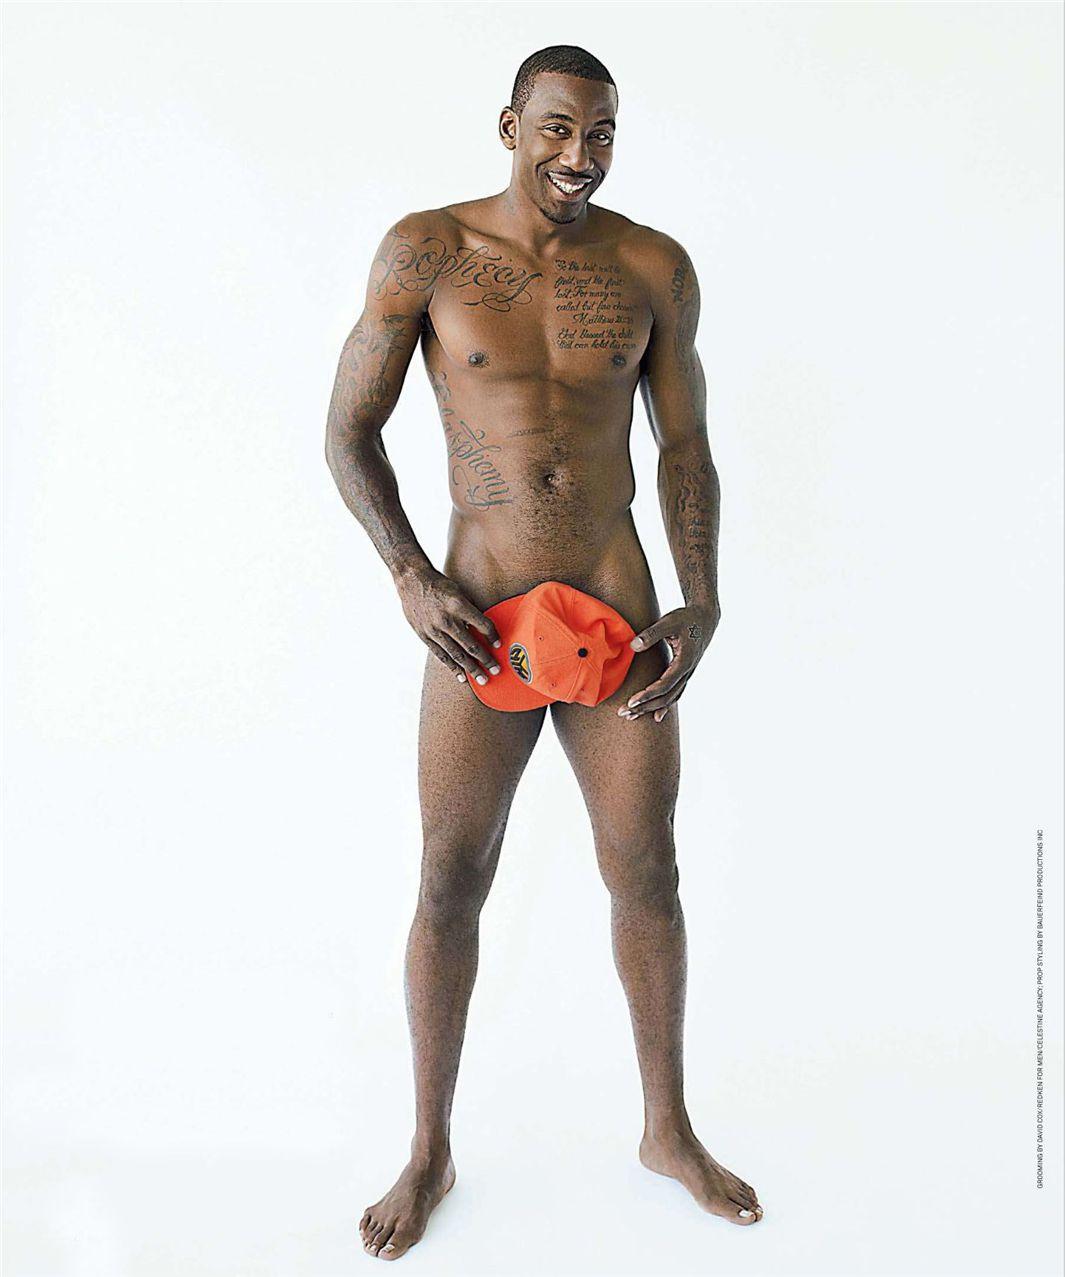 Амаре Стаудмайер / Amare Stoudemire - ESPN Magazine Body Issue 18 october 2010